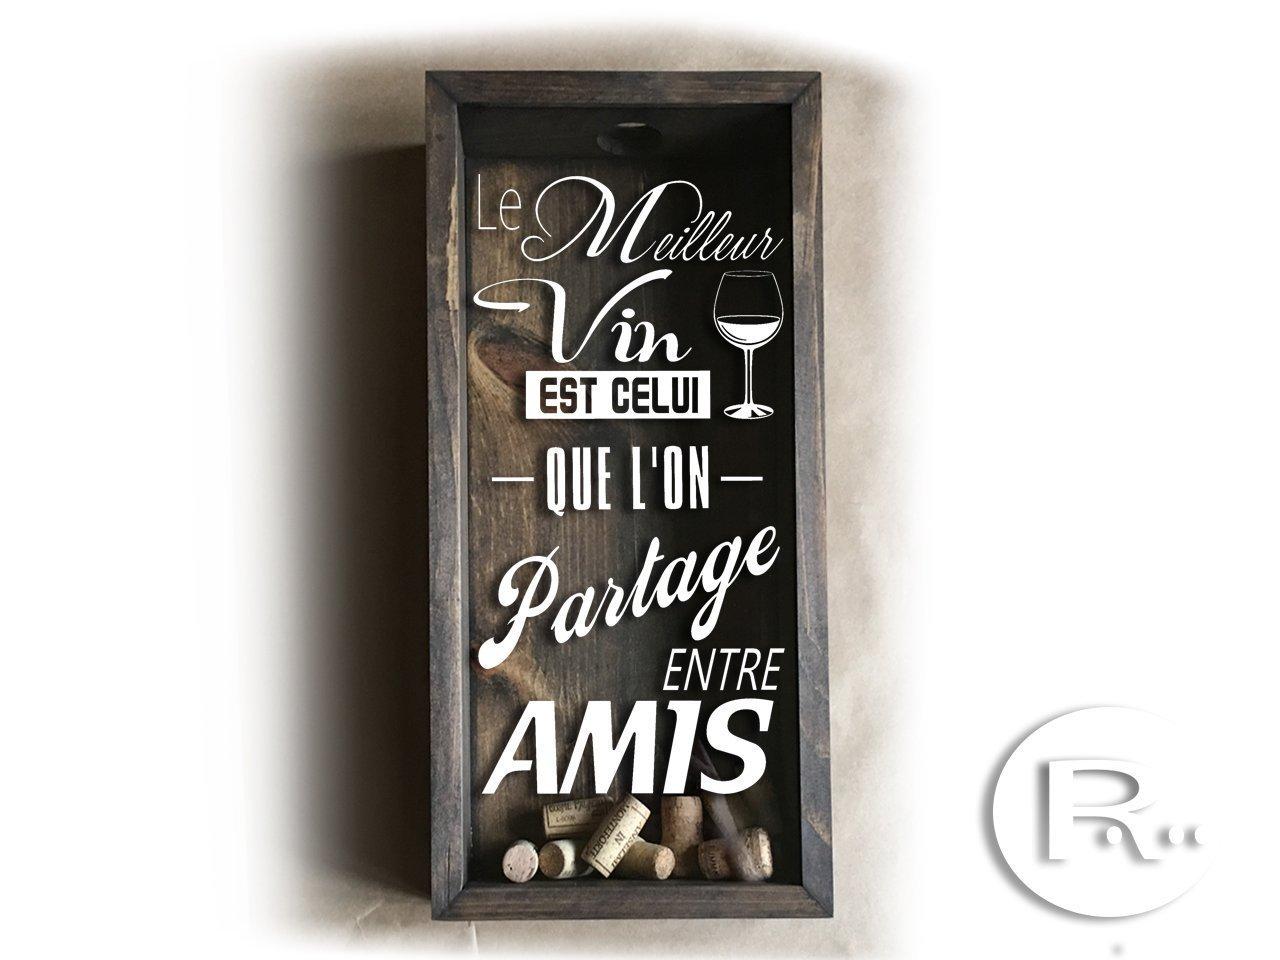 Wine Cork Holder Shadow Box 19 x 9.5 x 3.5